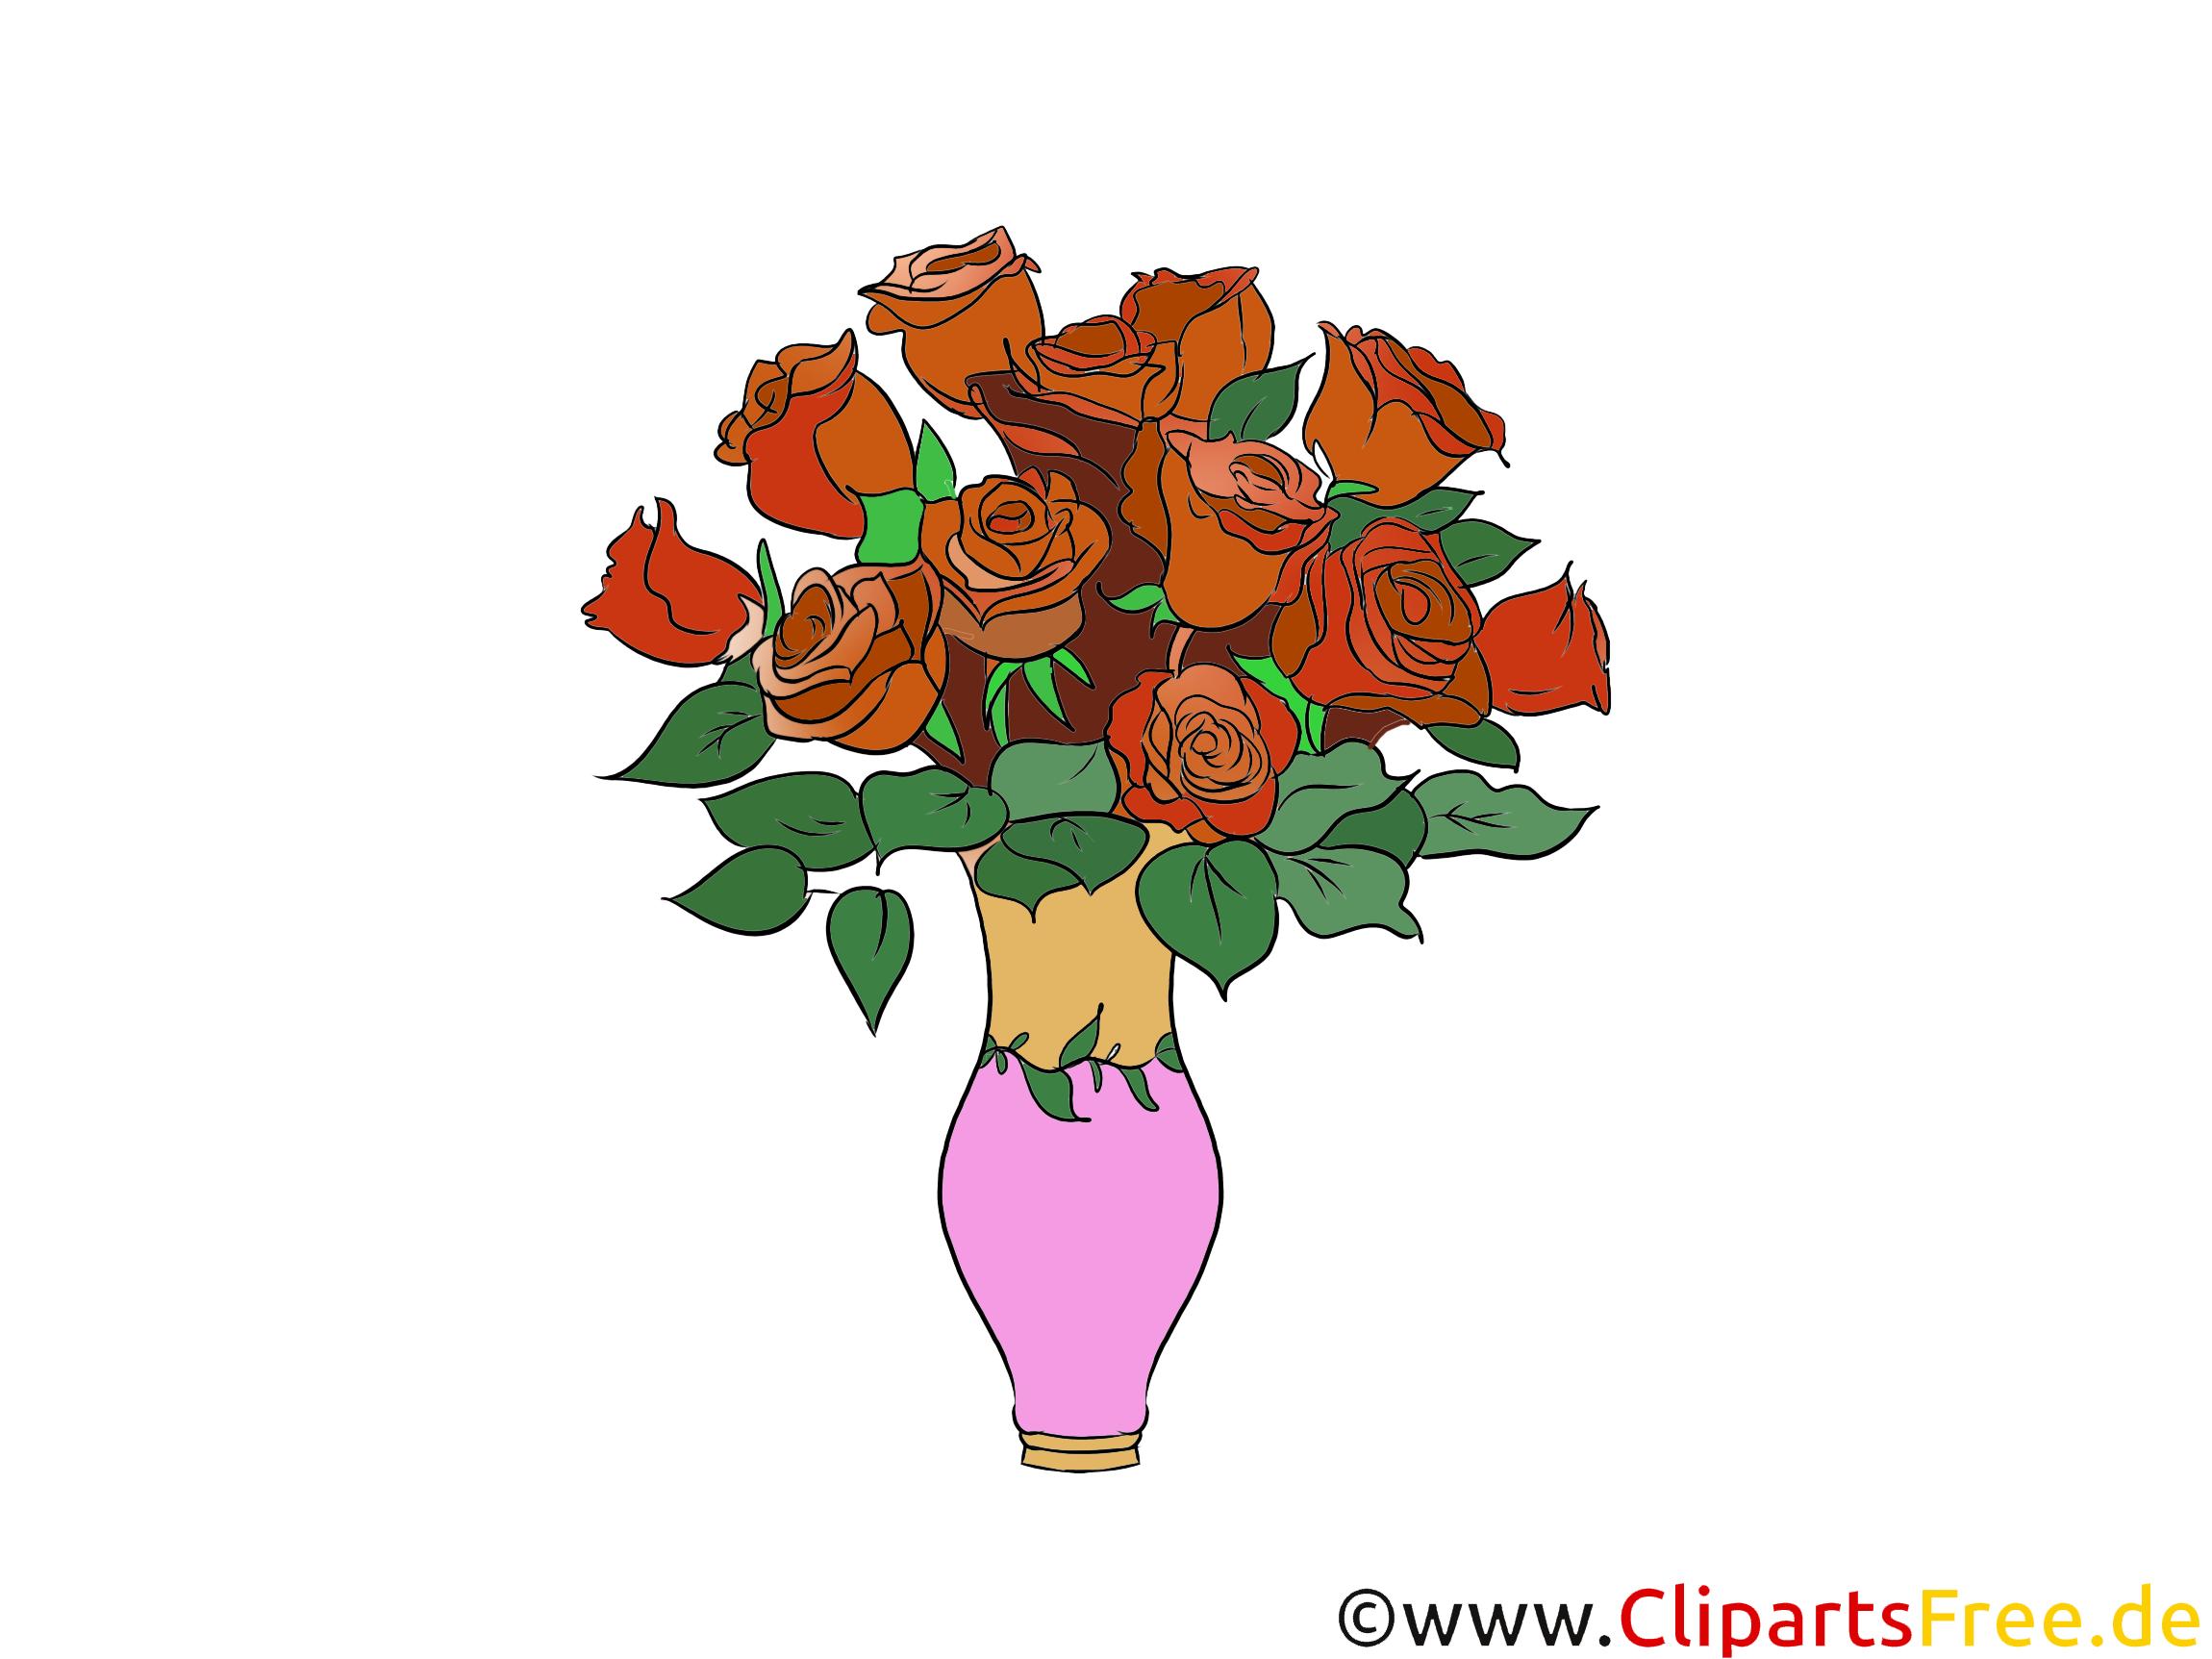 Rote Rosen in Vase Clipart, Bild, Grafik kostenlos